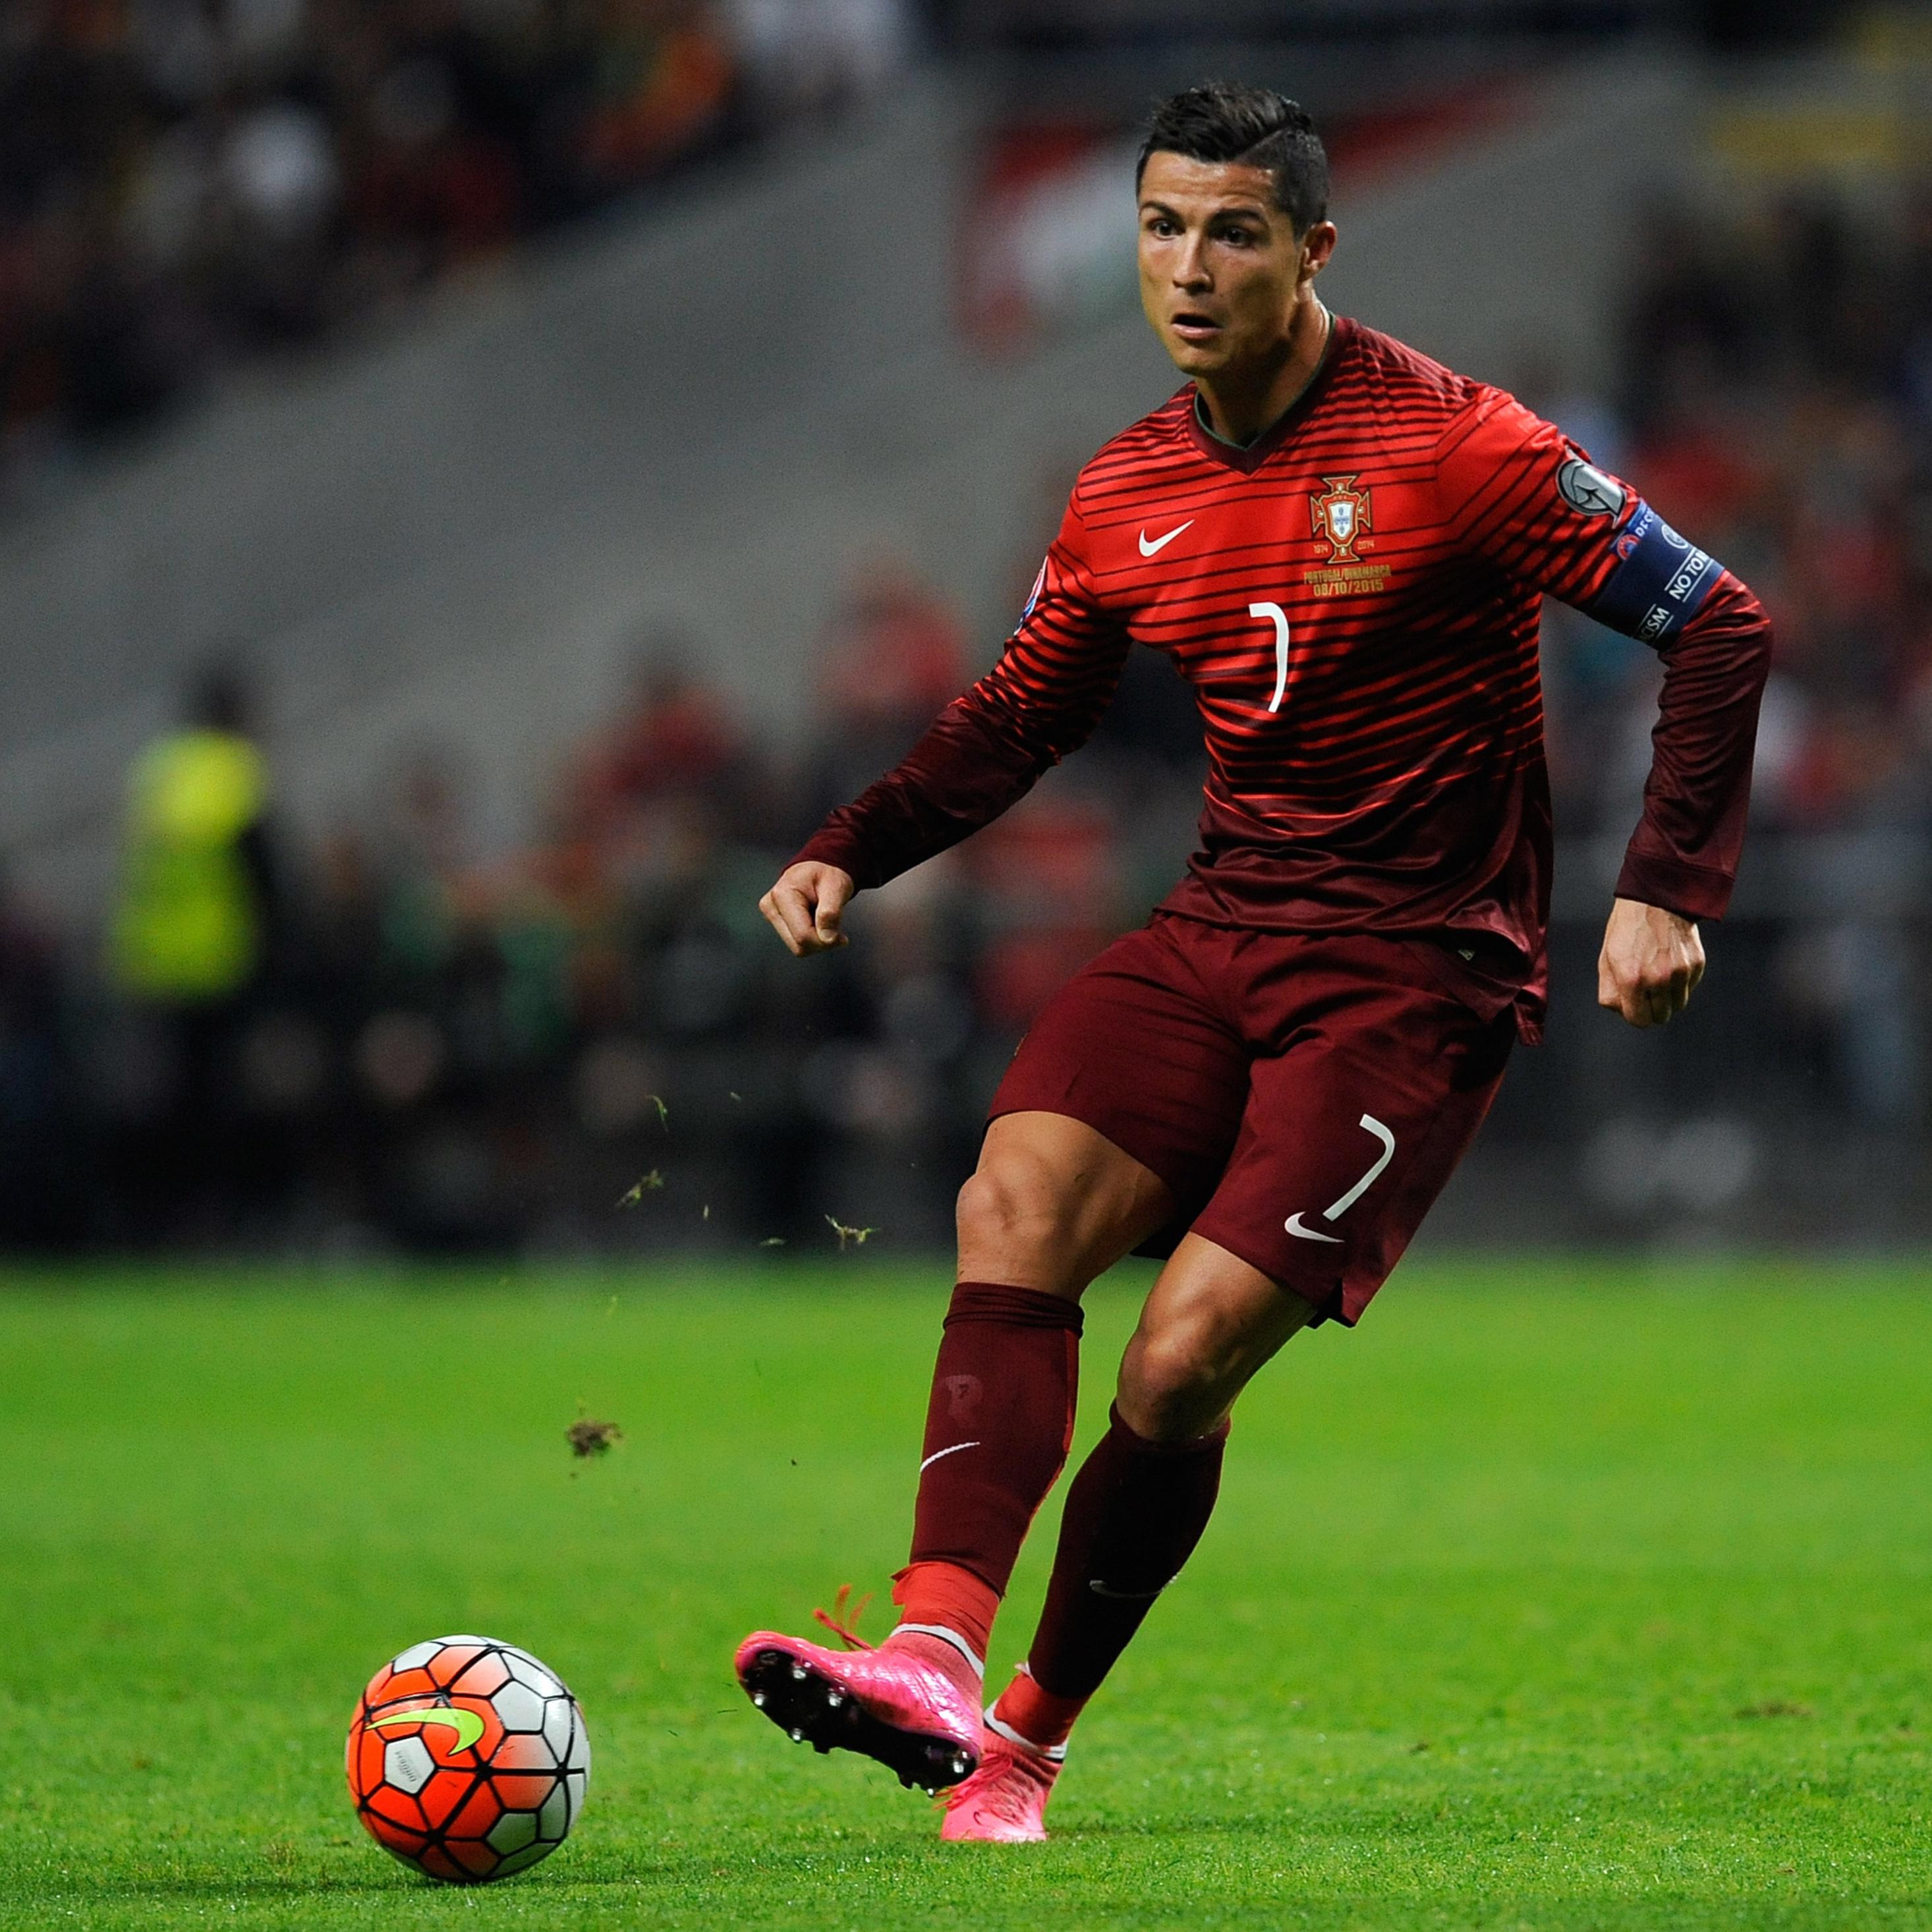 Cristiano Ronaldo Wallpaper: 2932x2932 Cristiano Ronaldo Ipad Pro Retina Display HD 4k